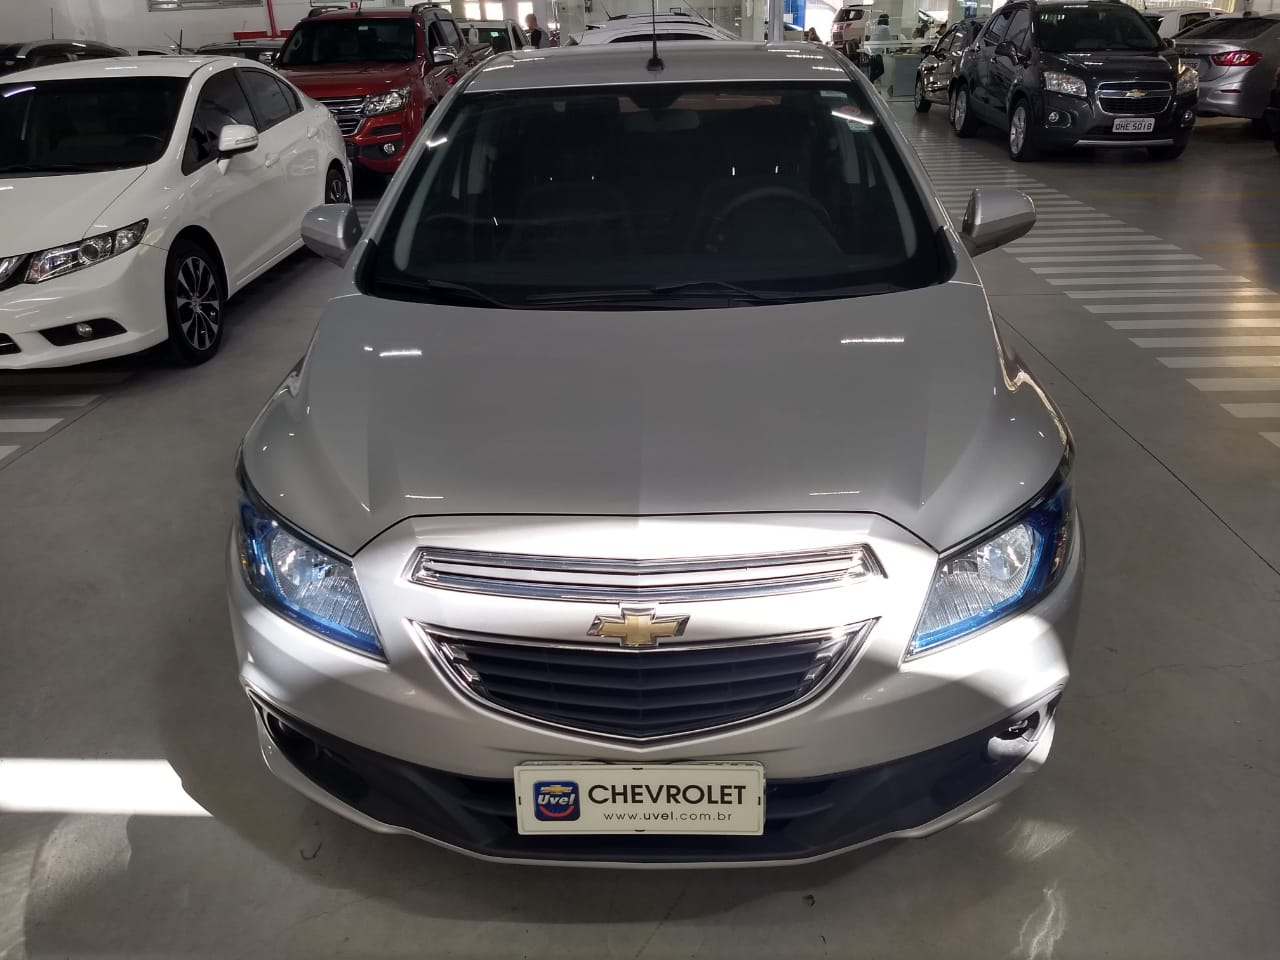 Chevrolet Prisma LT 1.4L 2014